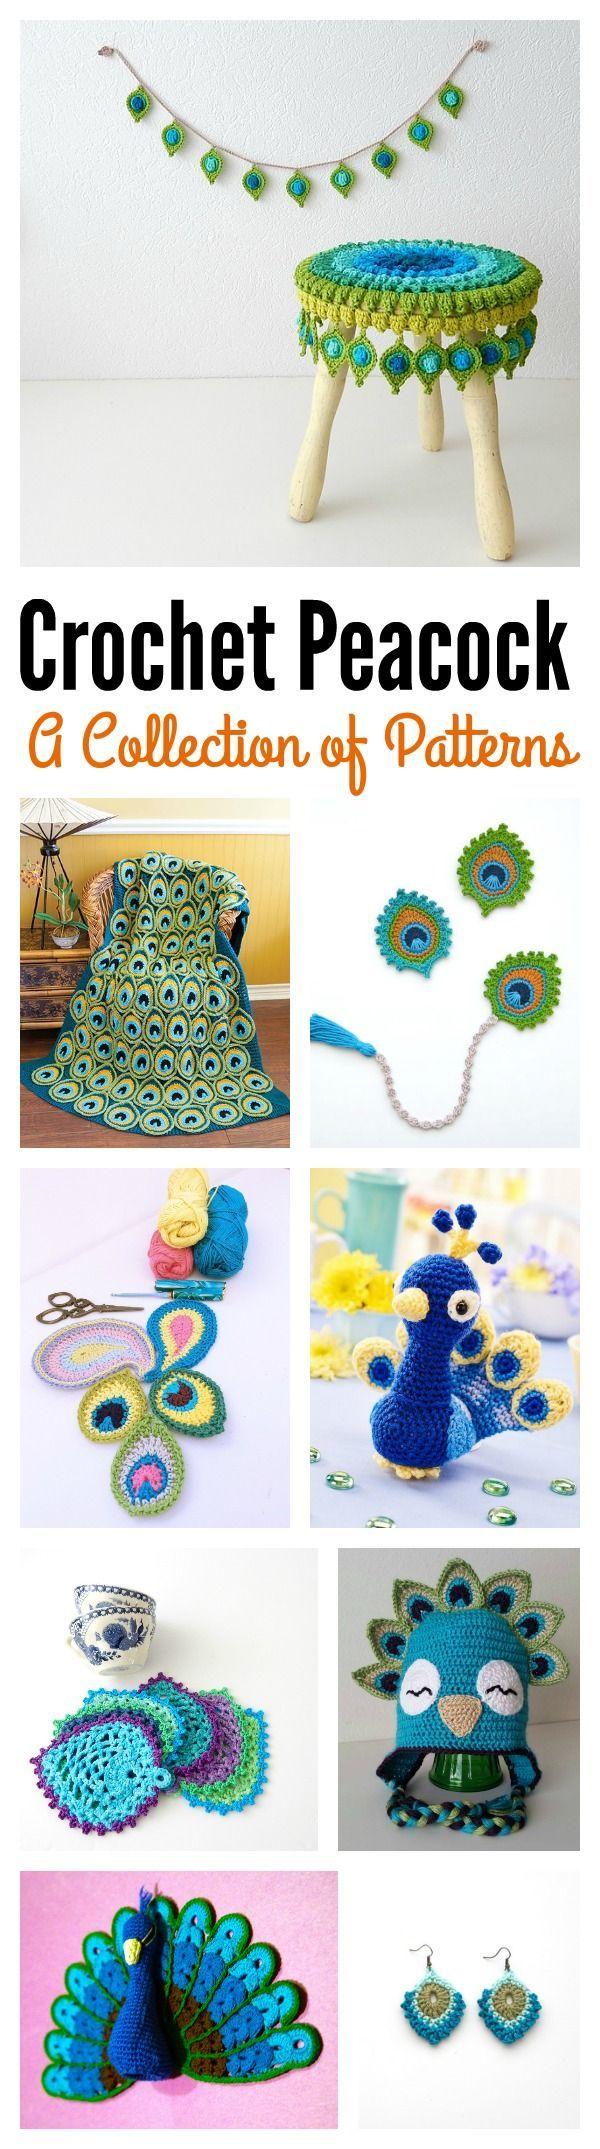 Crochet Pretty Peacock Blanket   Hermosa, Tejido y Ganchillo